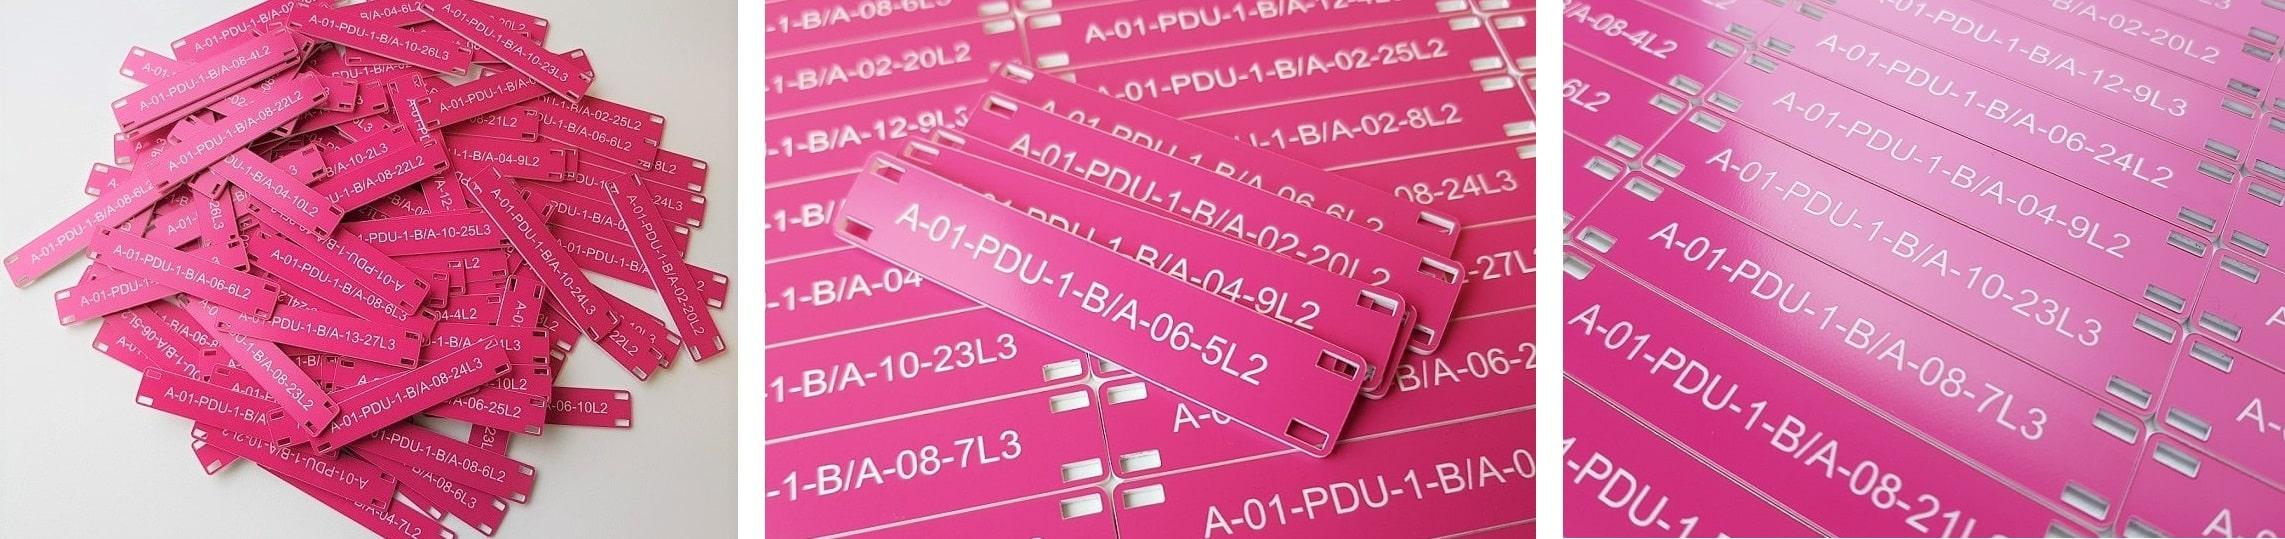 Engraved Plastic Marks